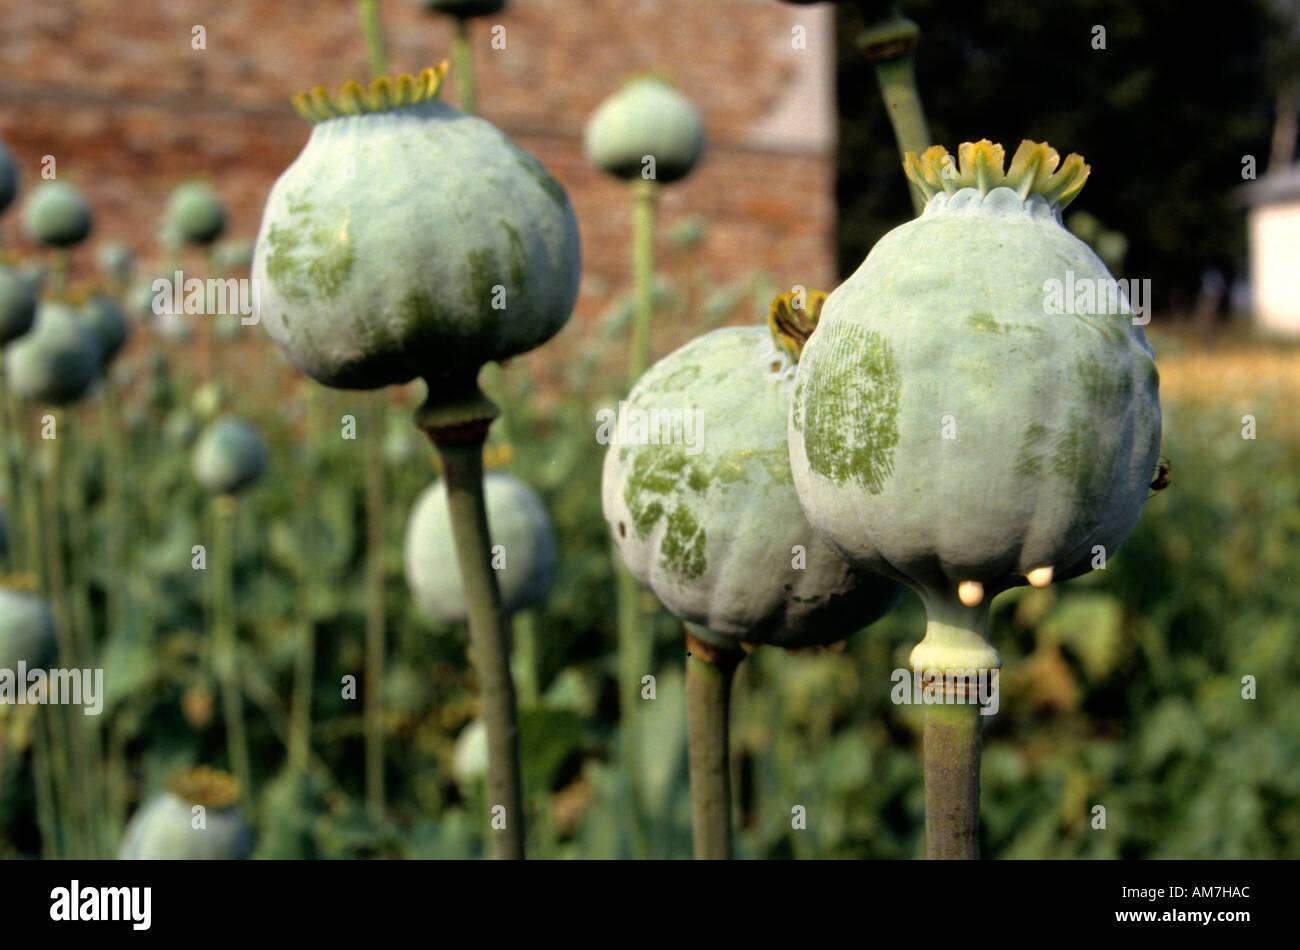 Opium Poppyhead Poppy Seed Drug Drugs Opium Stock Photo 4953515 Alamy